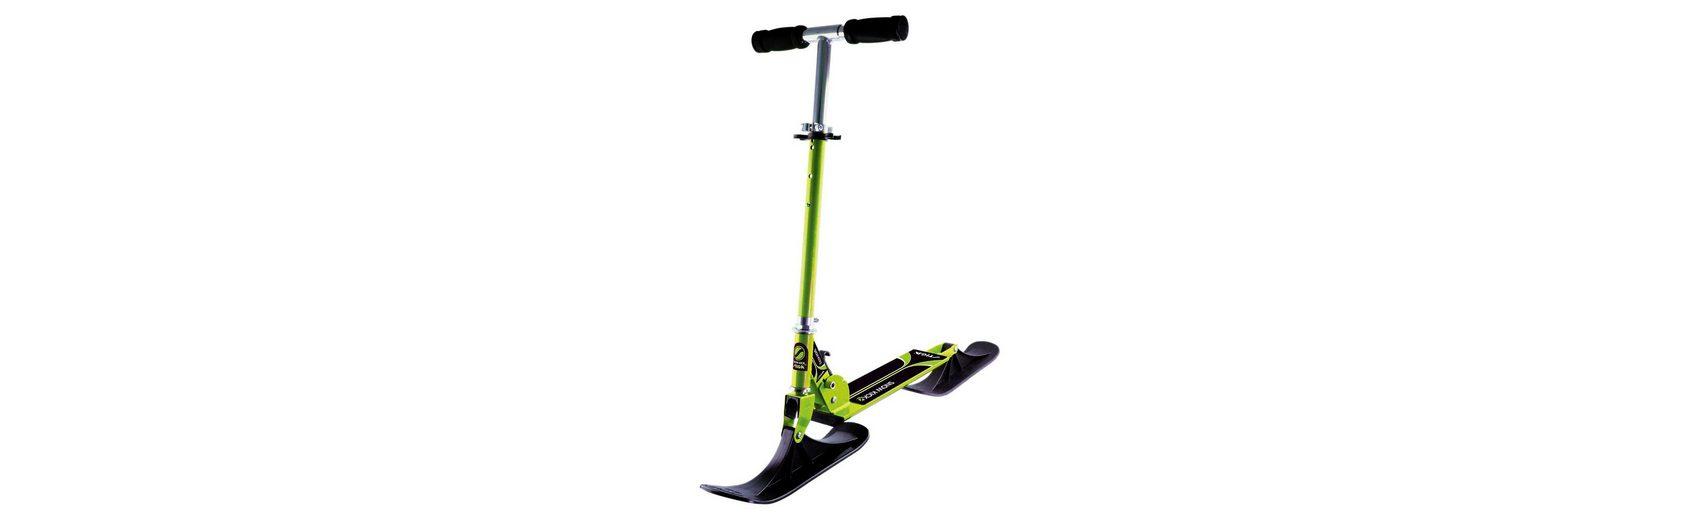 Stiga Snow Kick Bike grün